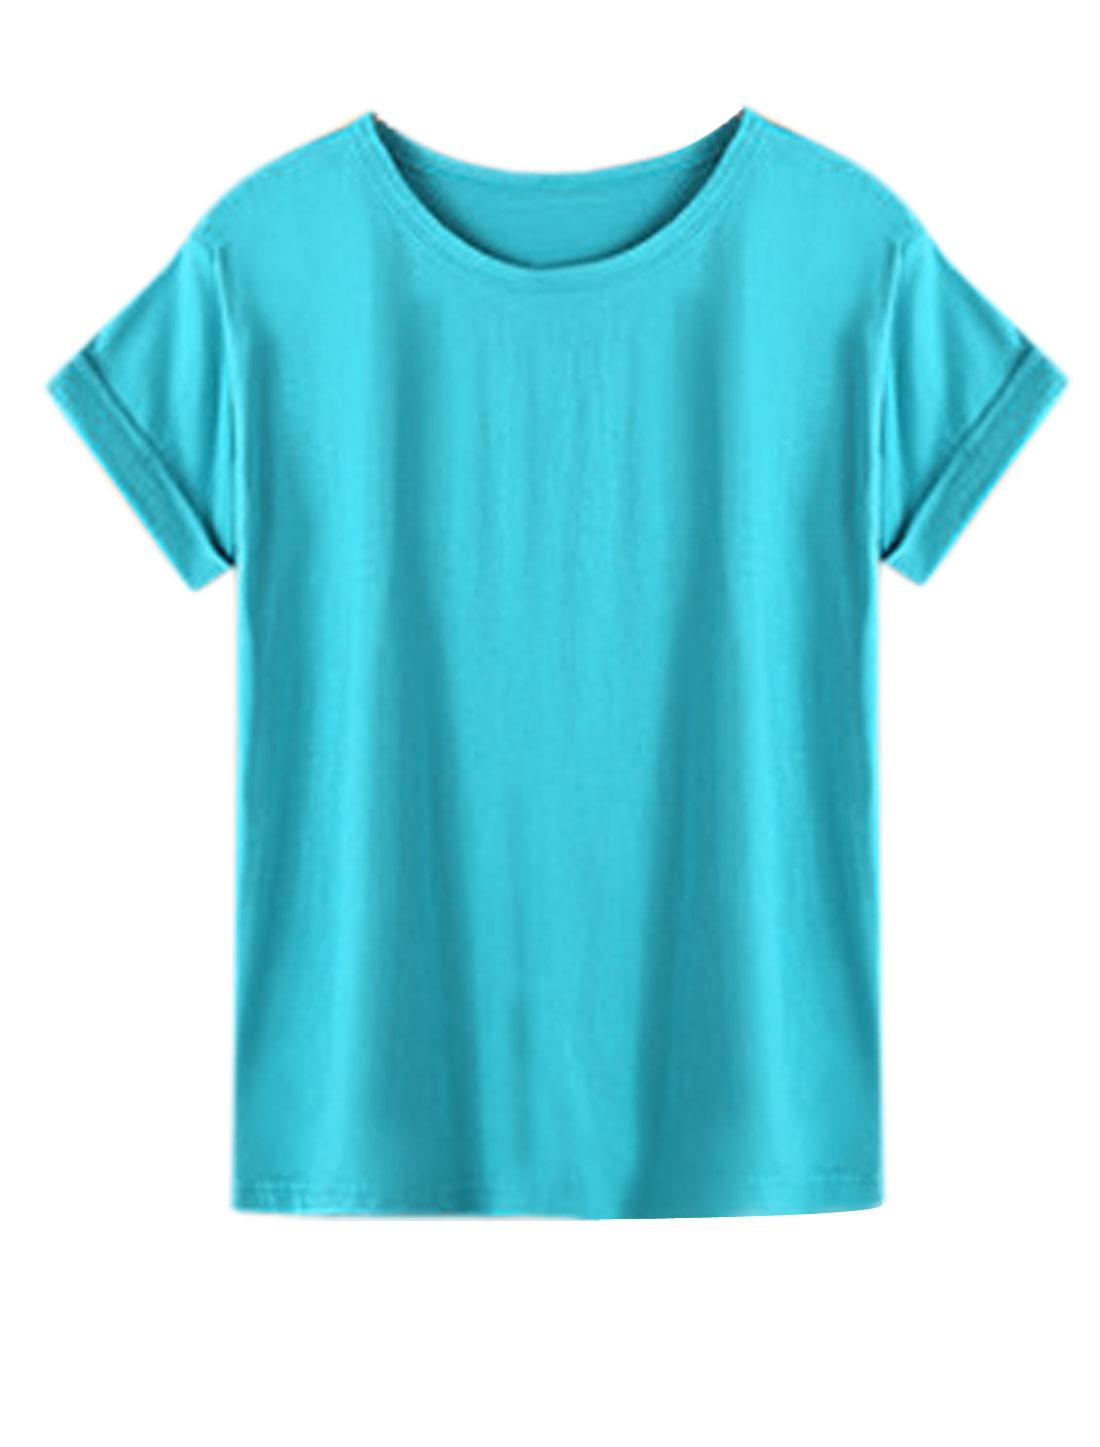 Women Slipover Short Sleeve Round Neck Summer Leisure T Shirt Aqua XS